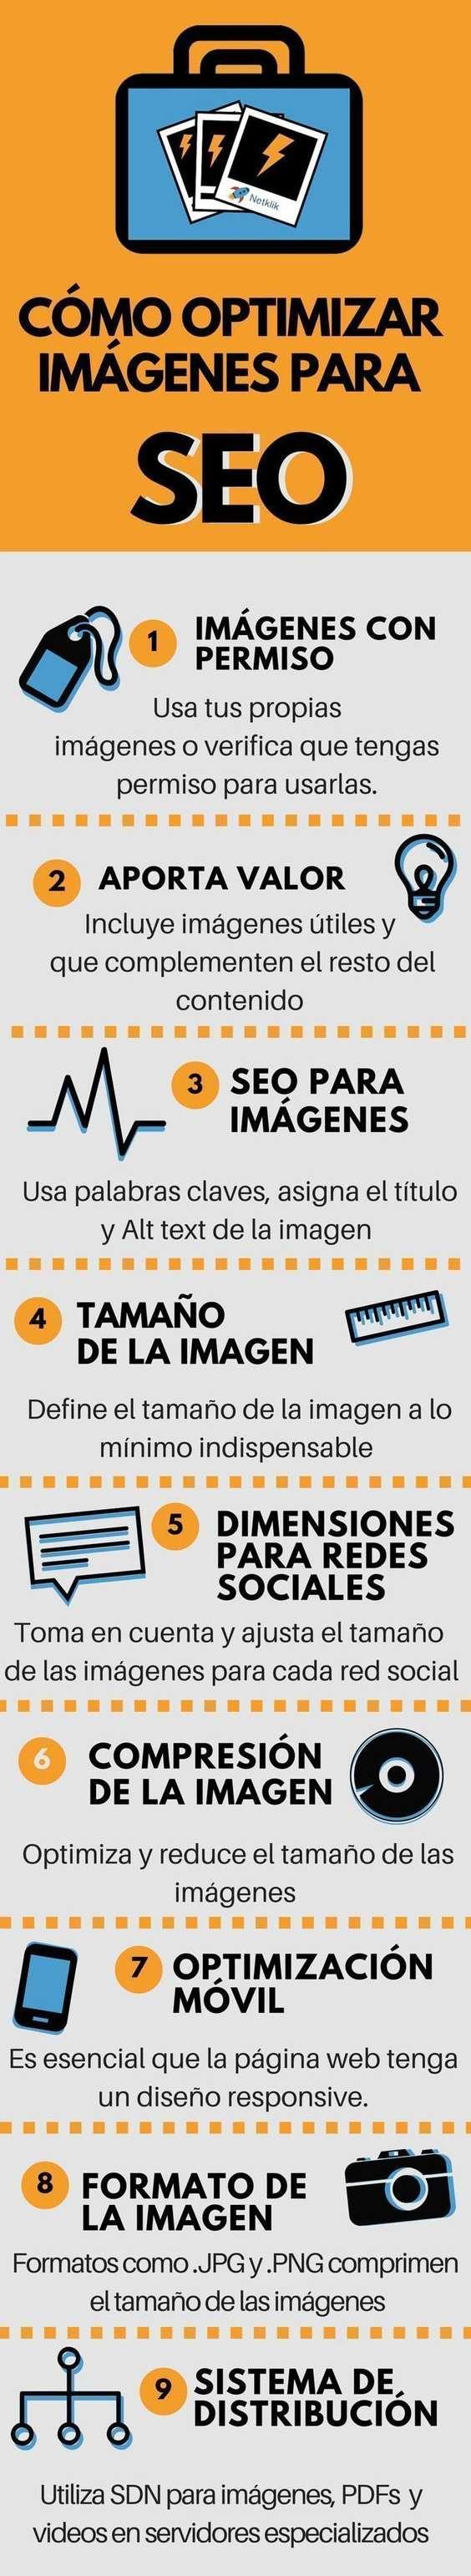 tips-seo-imagenes-infografia